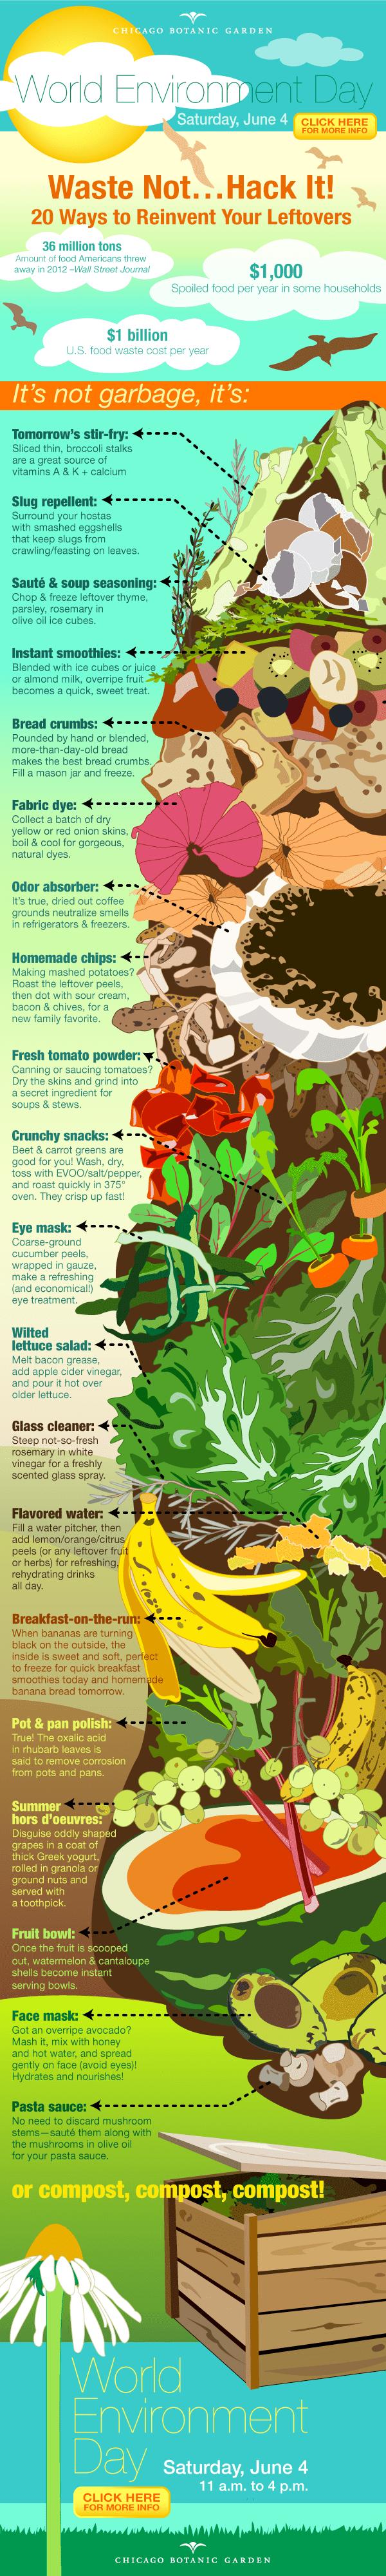 ILLUSTRATION: Food waste infographic.